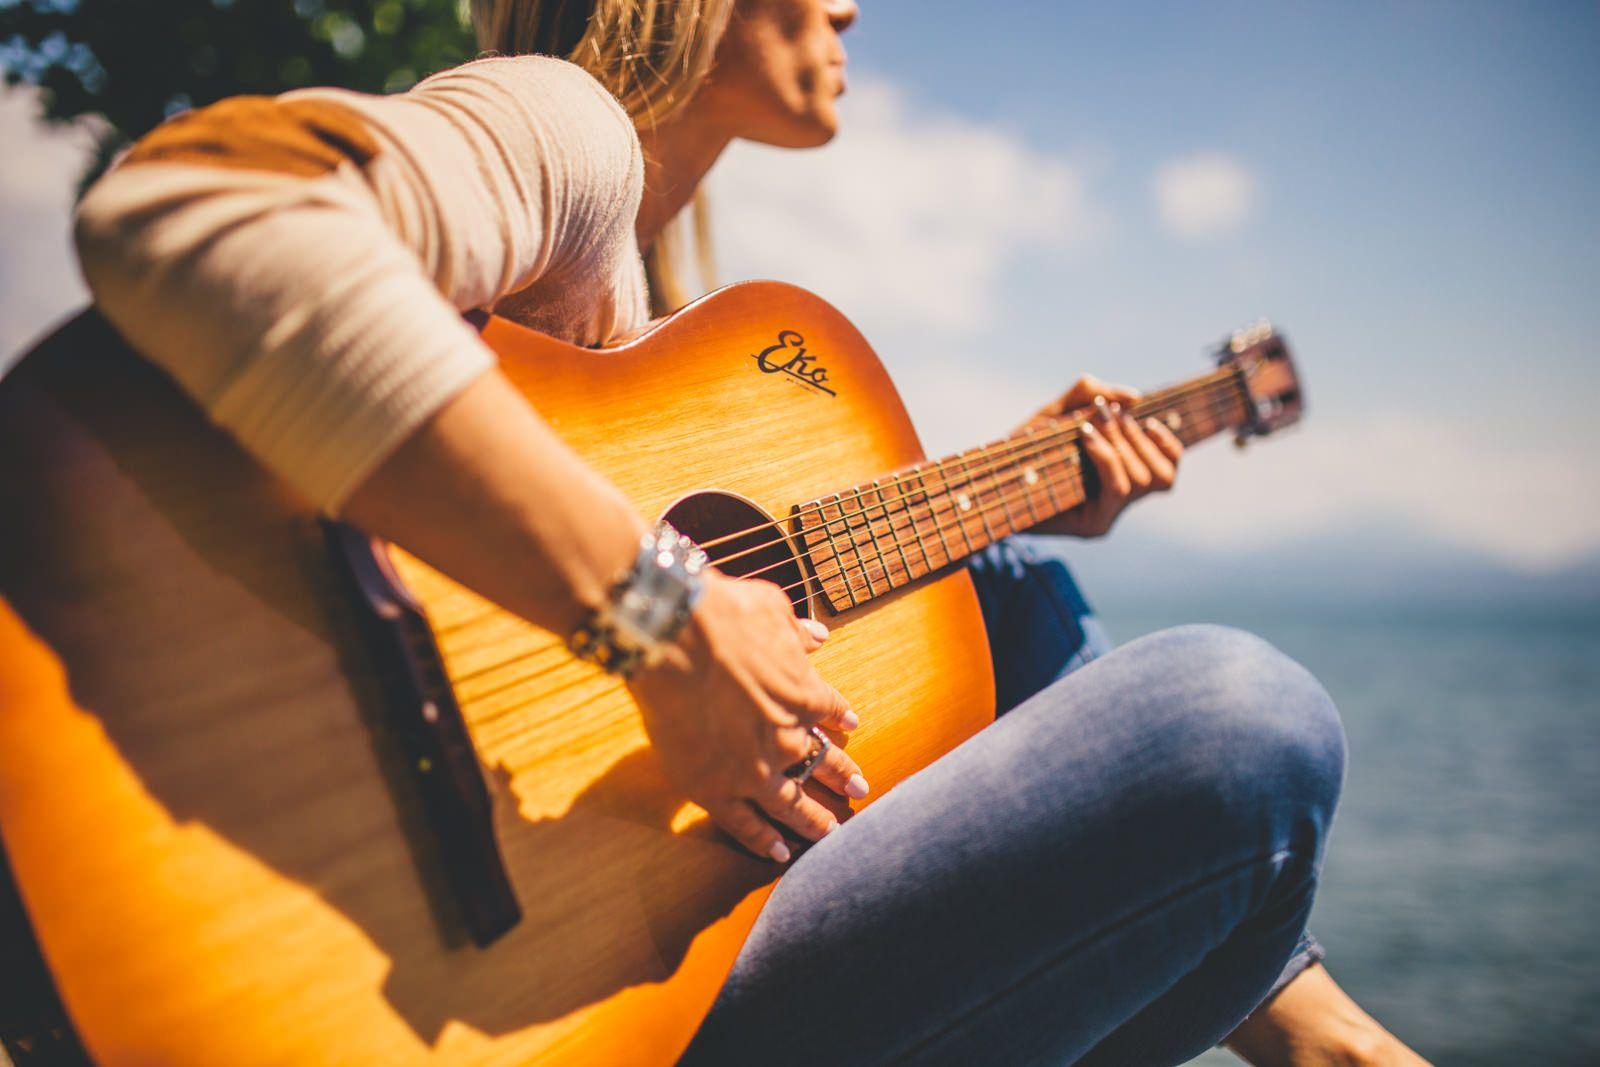 Woman playing guitar Music, Good summer songs, Playing